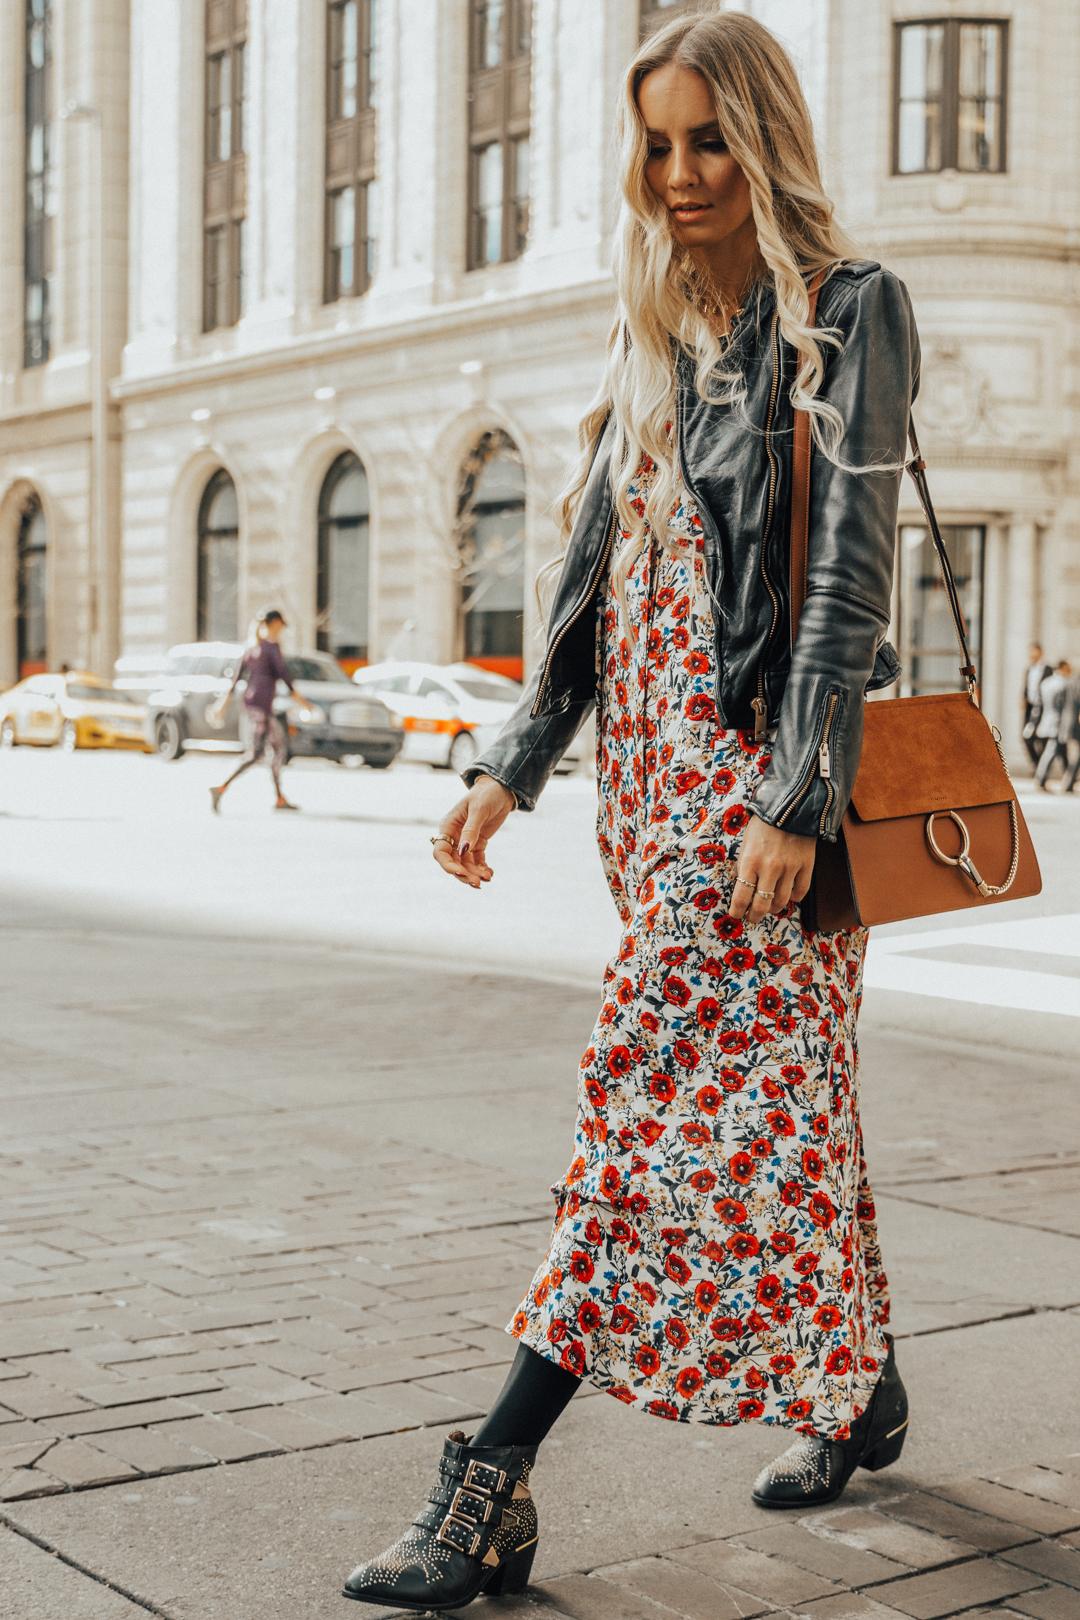 e8e90c7a17d Fall Autumn Outfit Floral Maxi Dress Leather Jacket CHloe Boots Chloe Bag-12